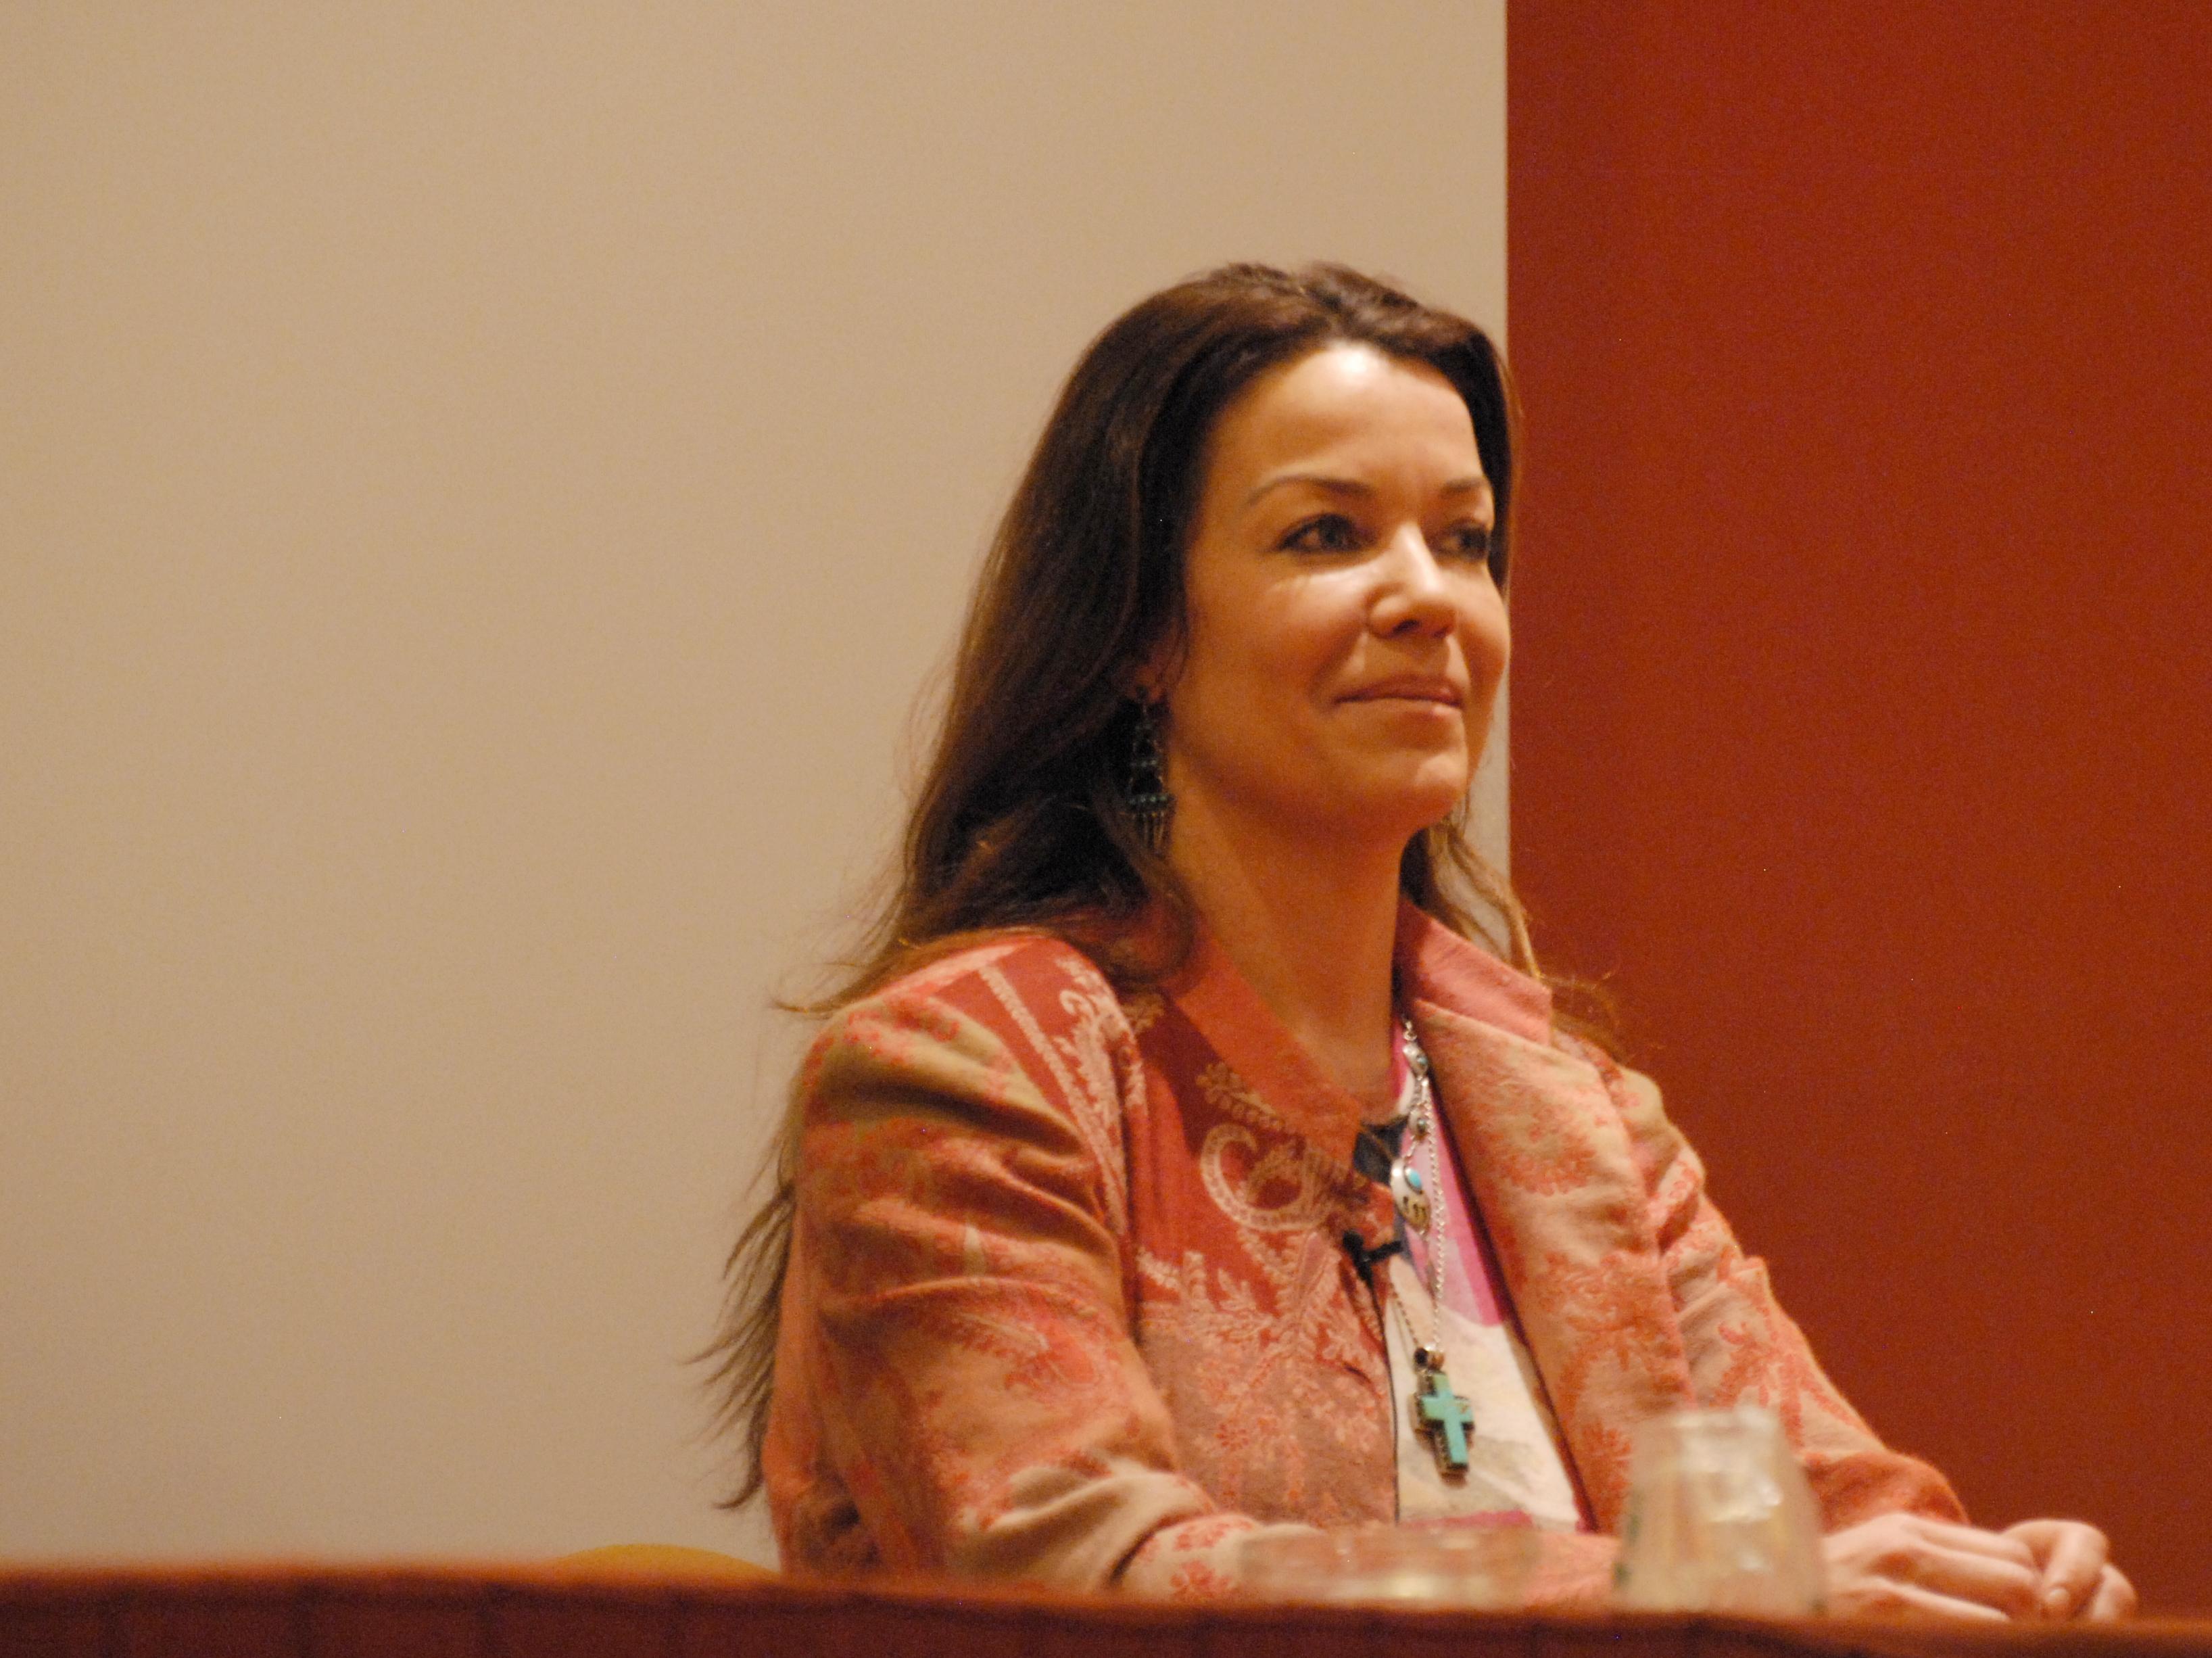 File:Claudia Christian 02 (2010).jpg - Wikimedia Commons